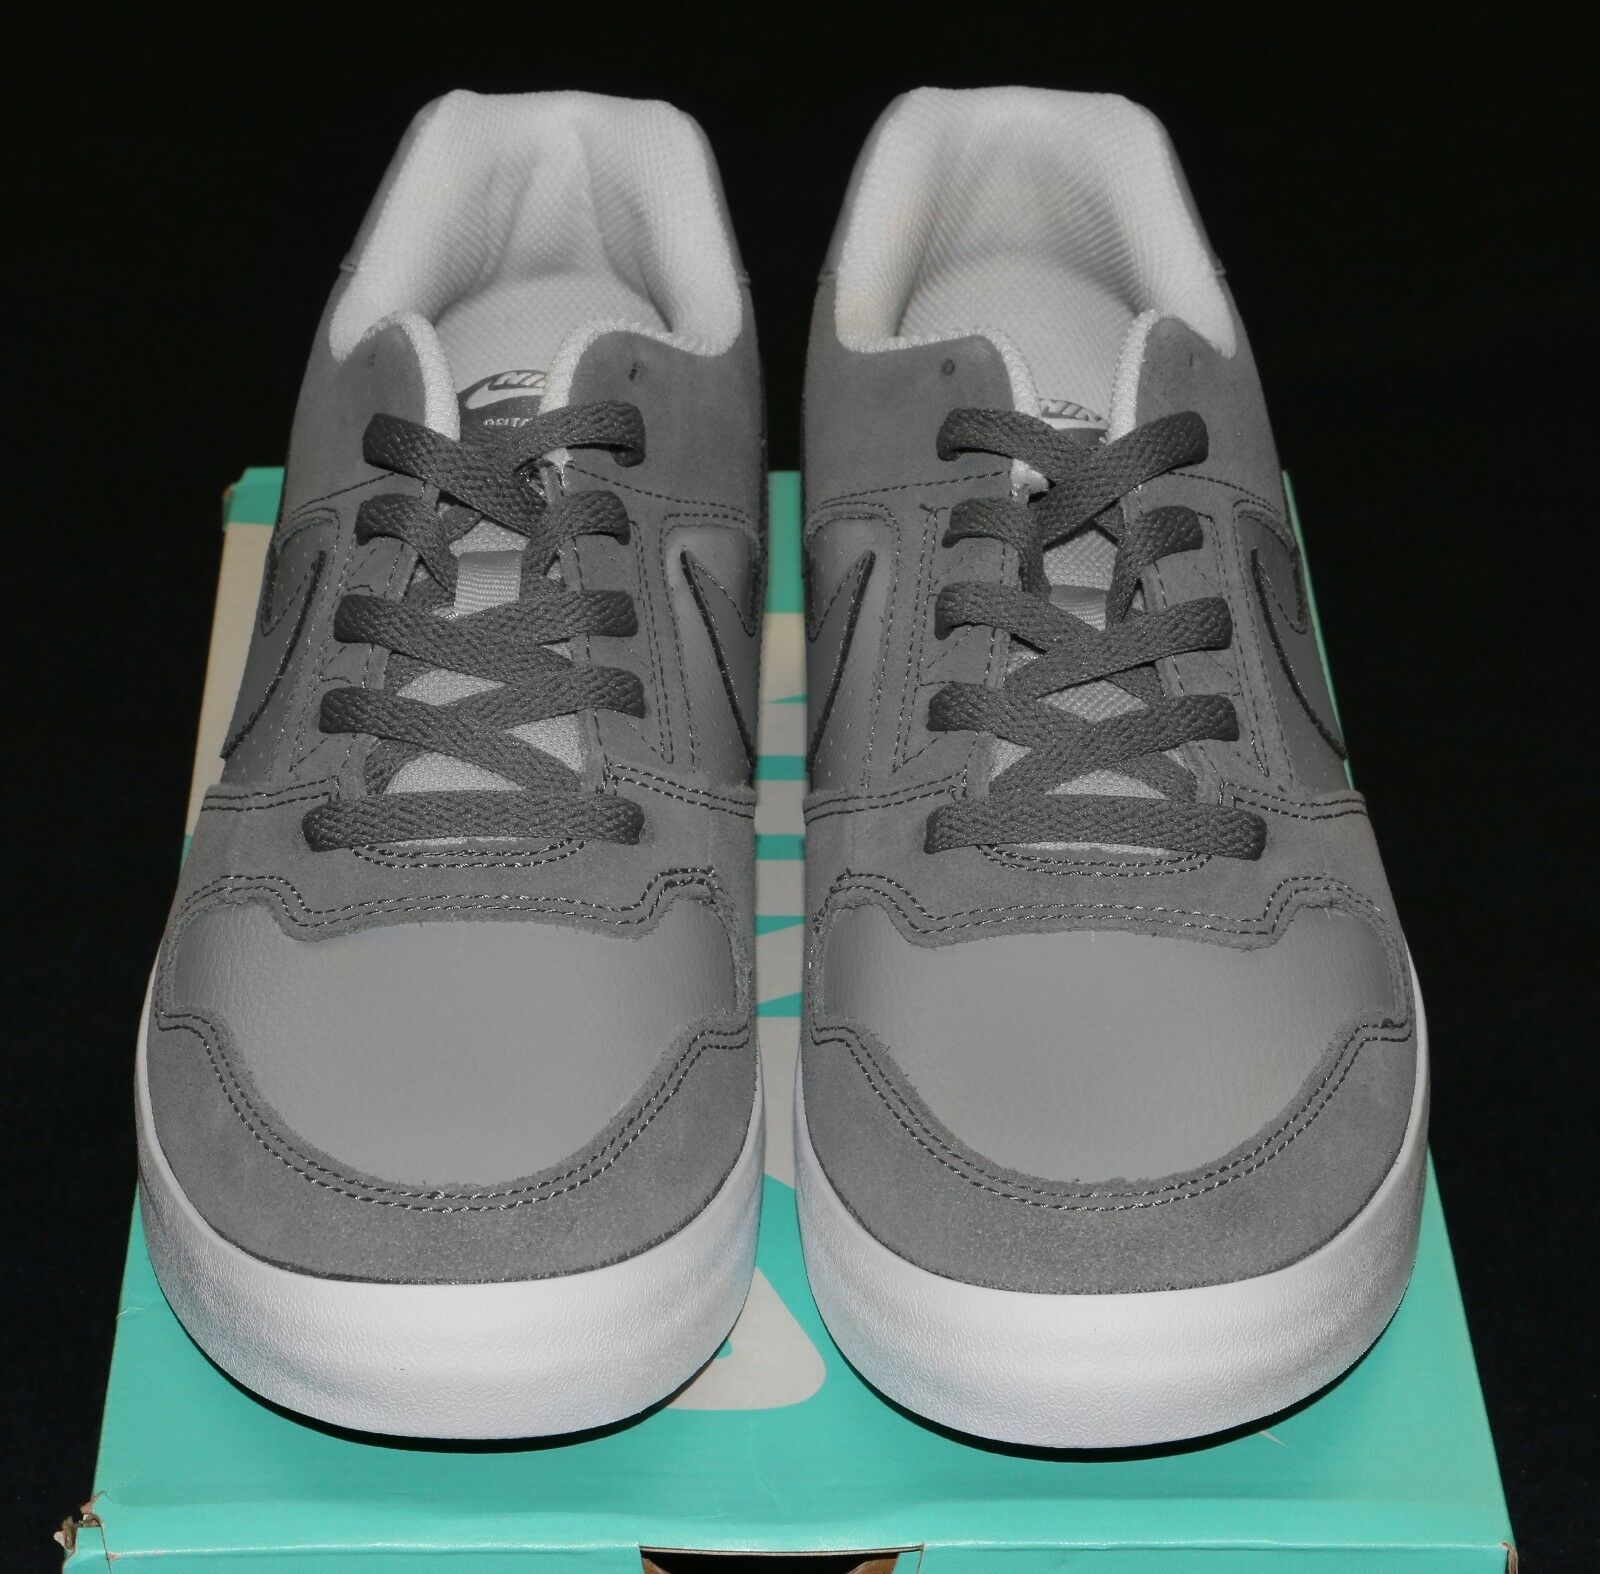 neue nike vulc männer sb delta force vulc nike skate - schuhe in größe 10 grau / weiß fe5100